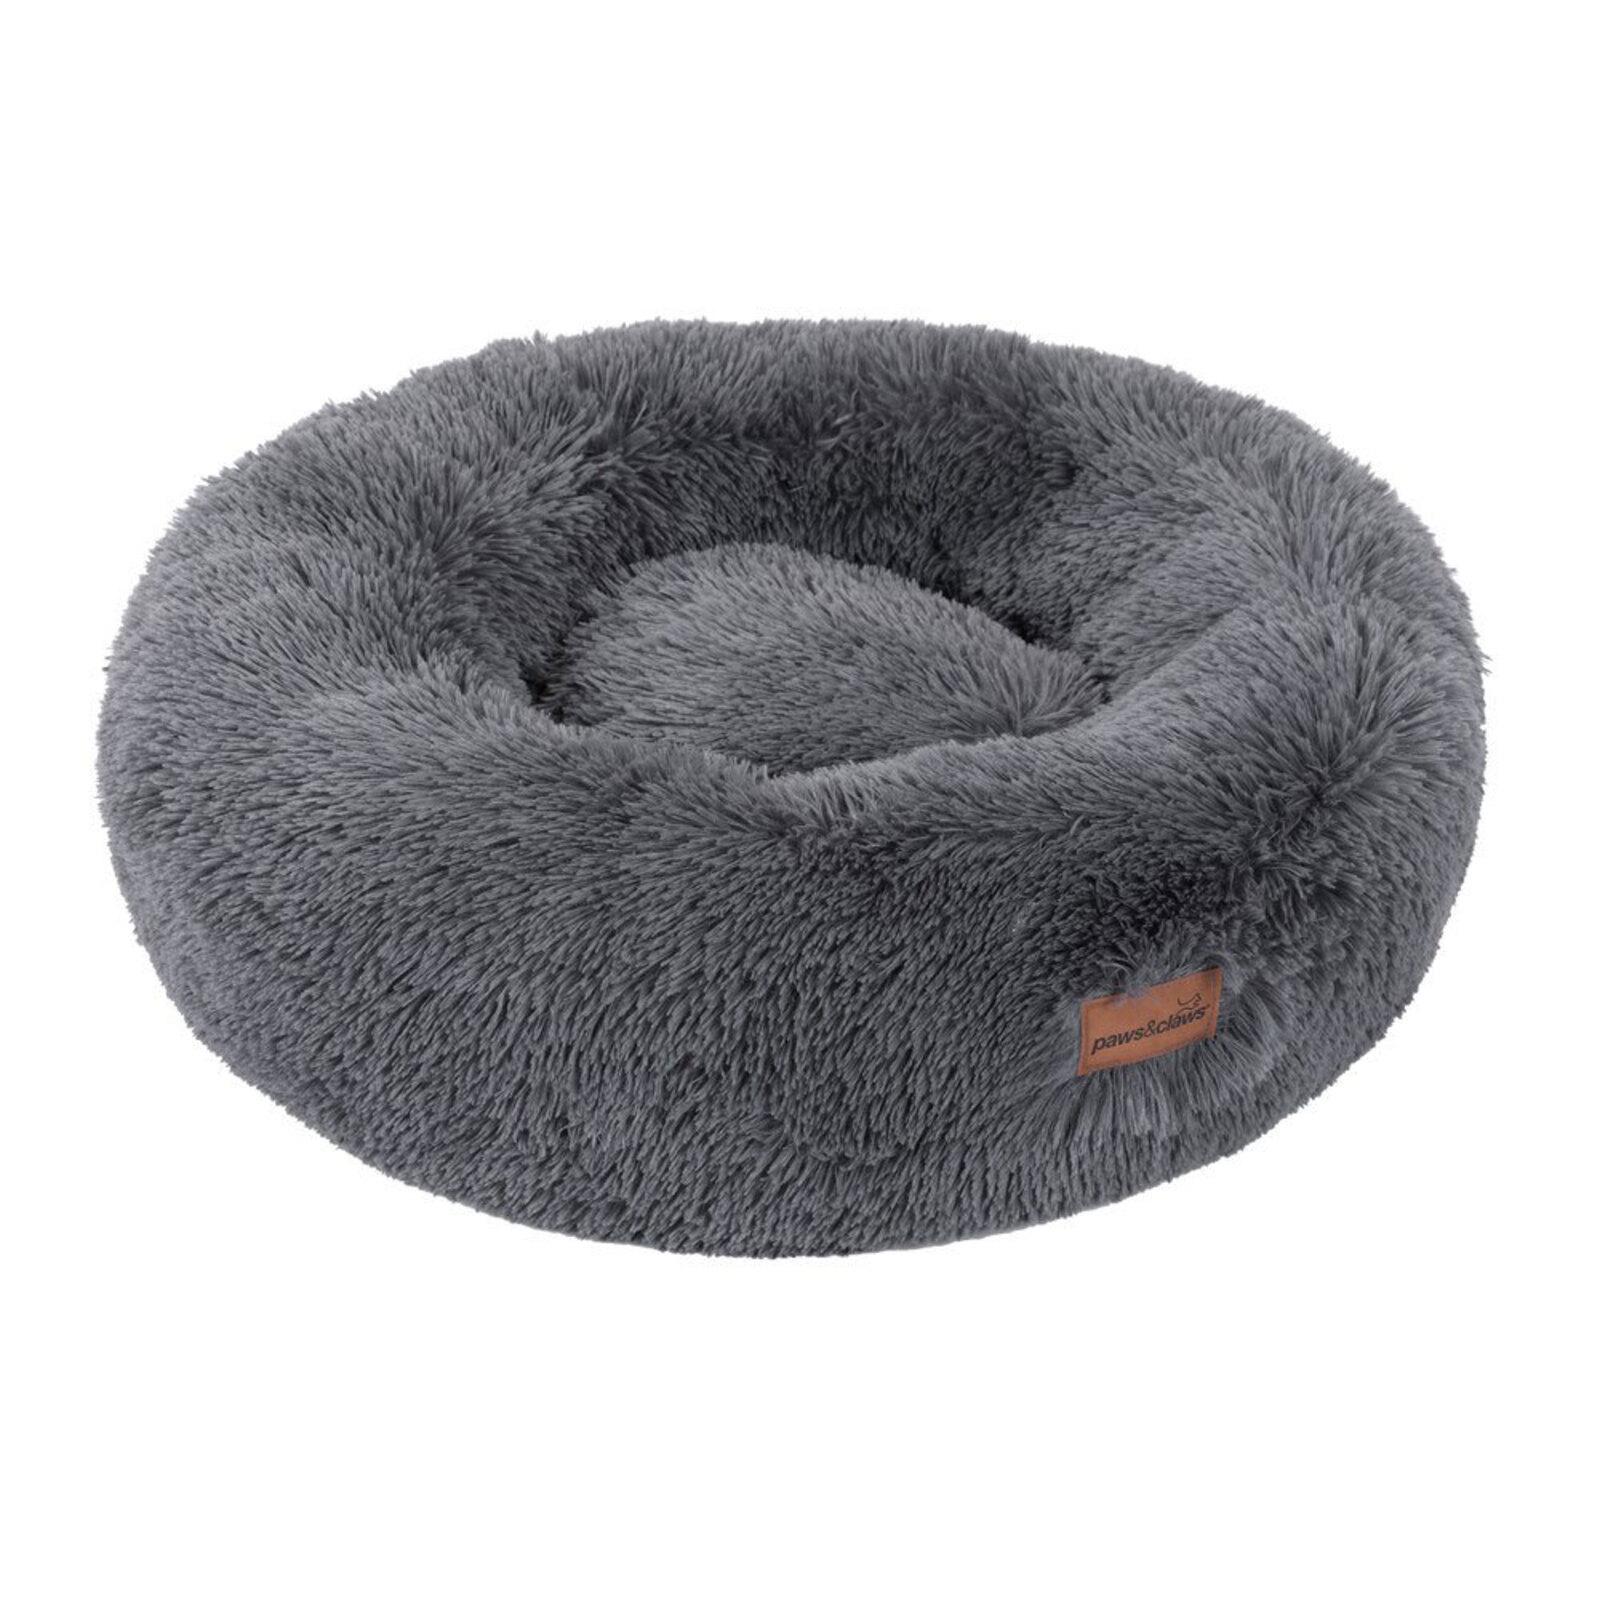 Paws & Claws 70cm x 70cm Large Calming Plush Pet/Dog Round Bed/Mattress Grey